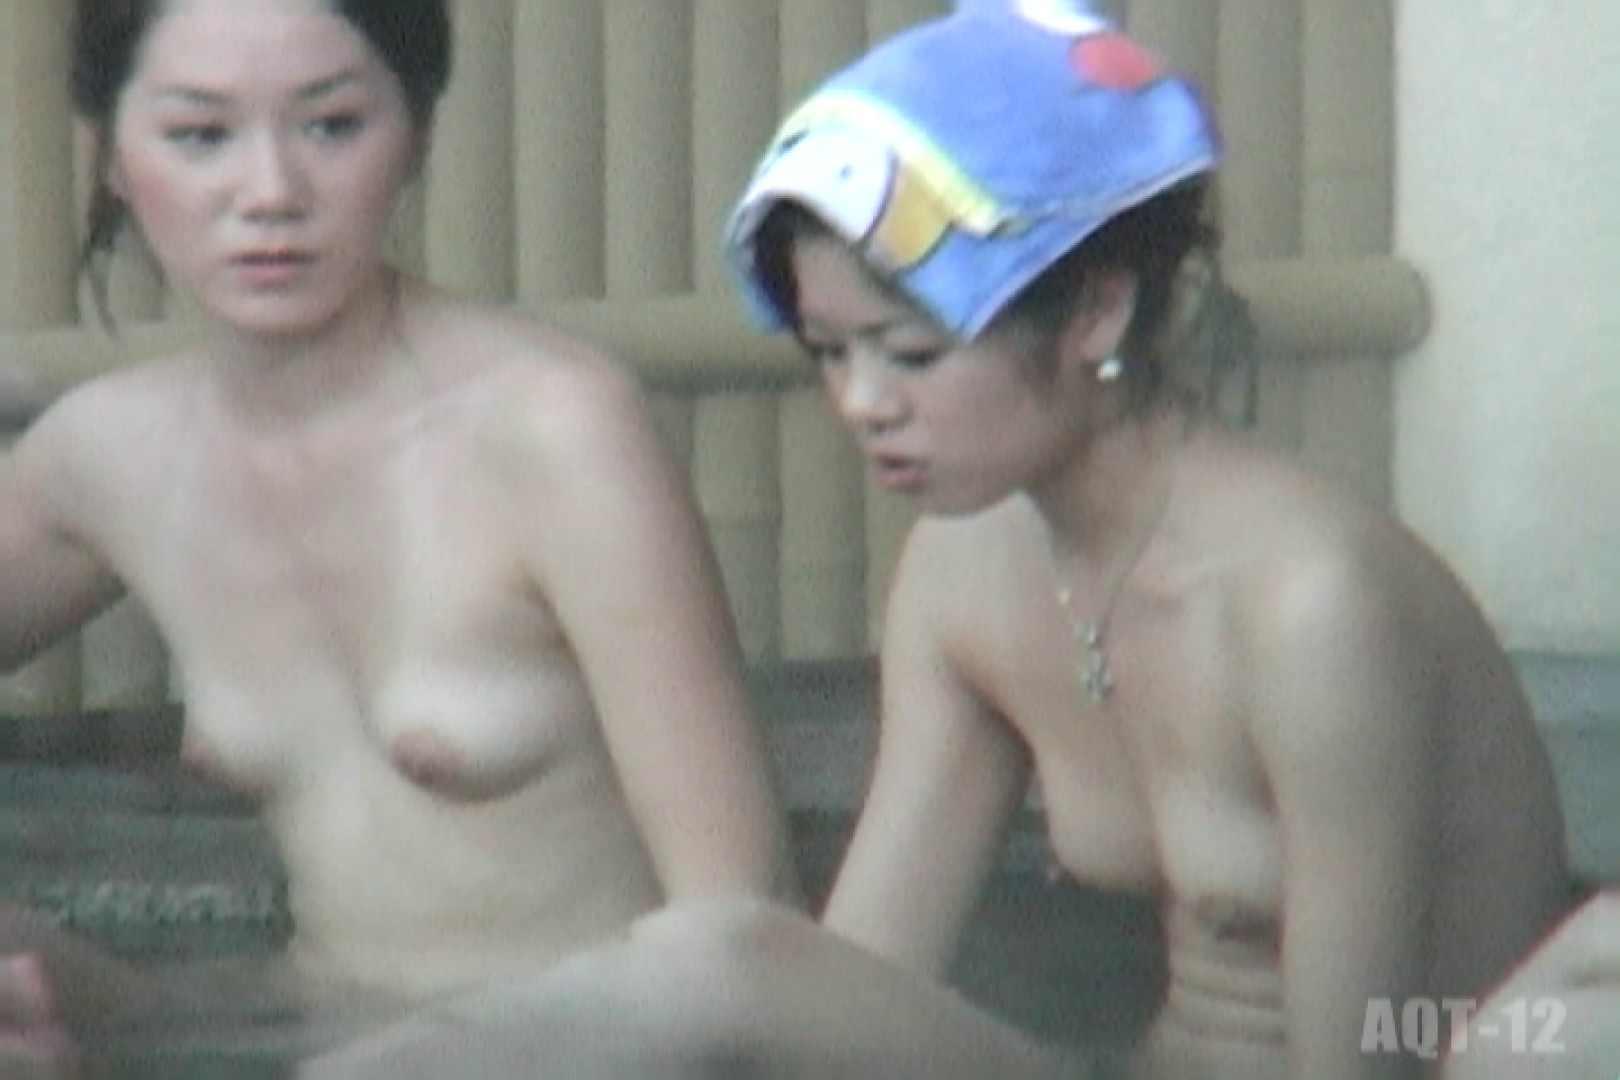 Aquaな露天風呂Vol.812 OLセックス  49画像 15